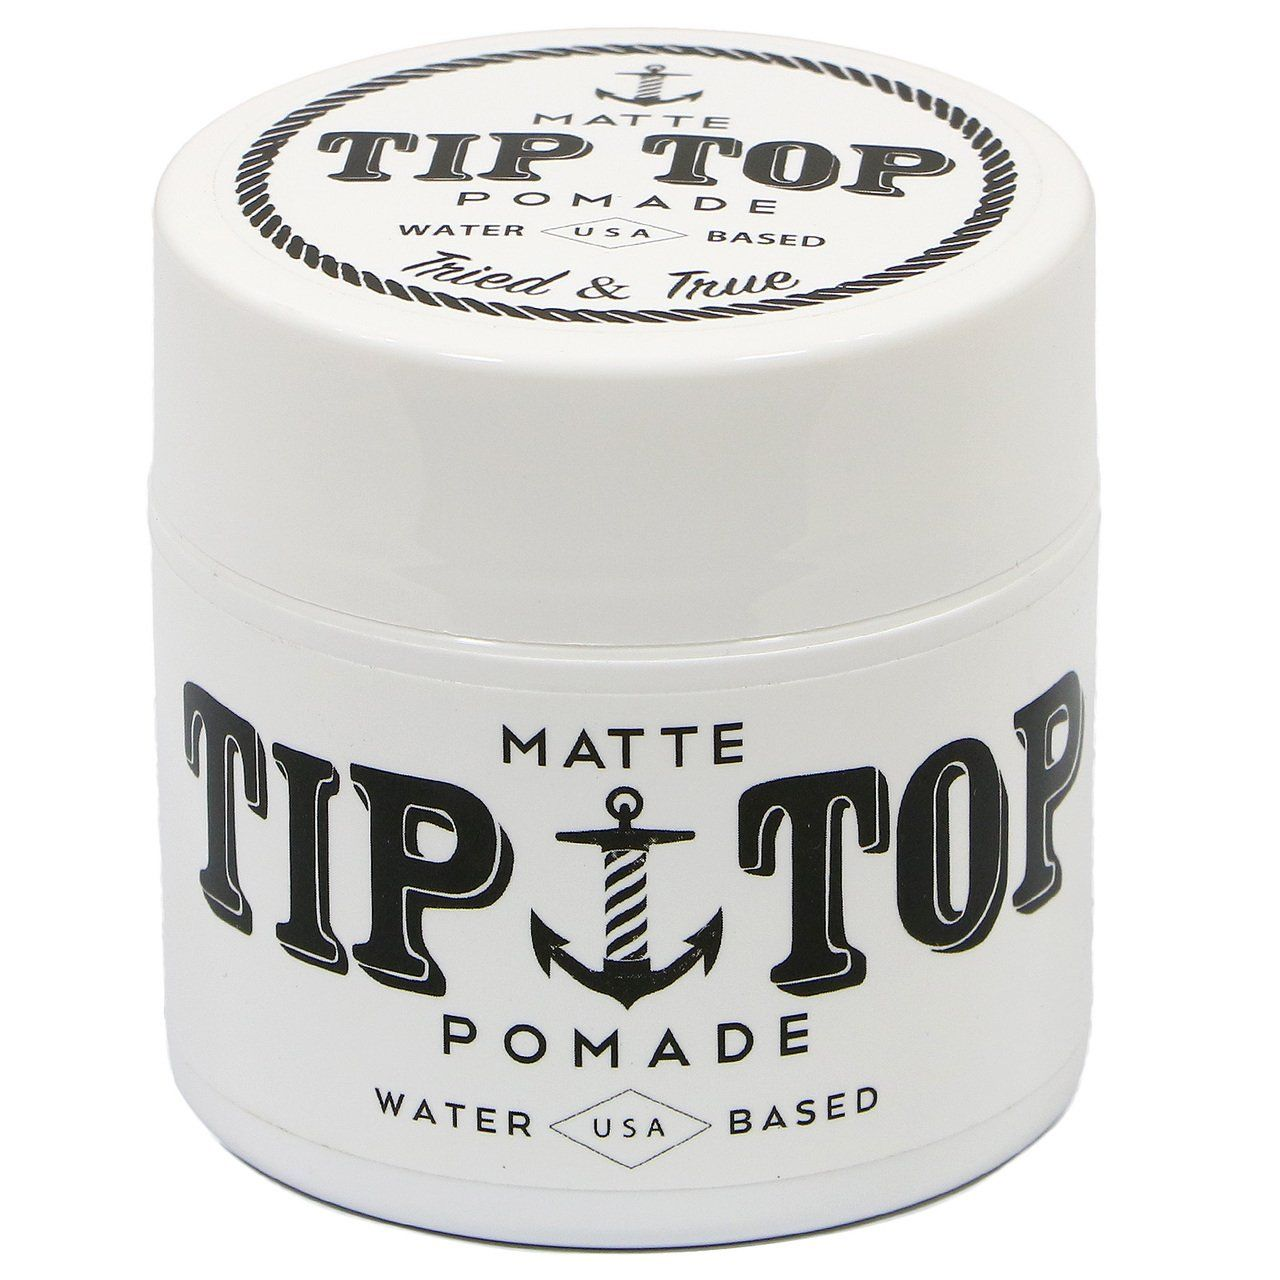 TIP TOP MATTE Pomade Water Based 4.25 oz Hair pomade